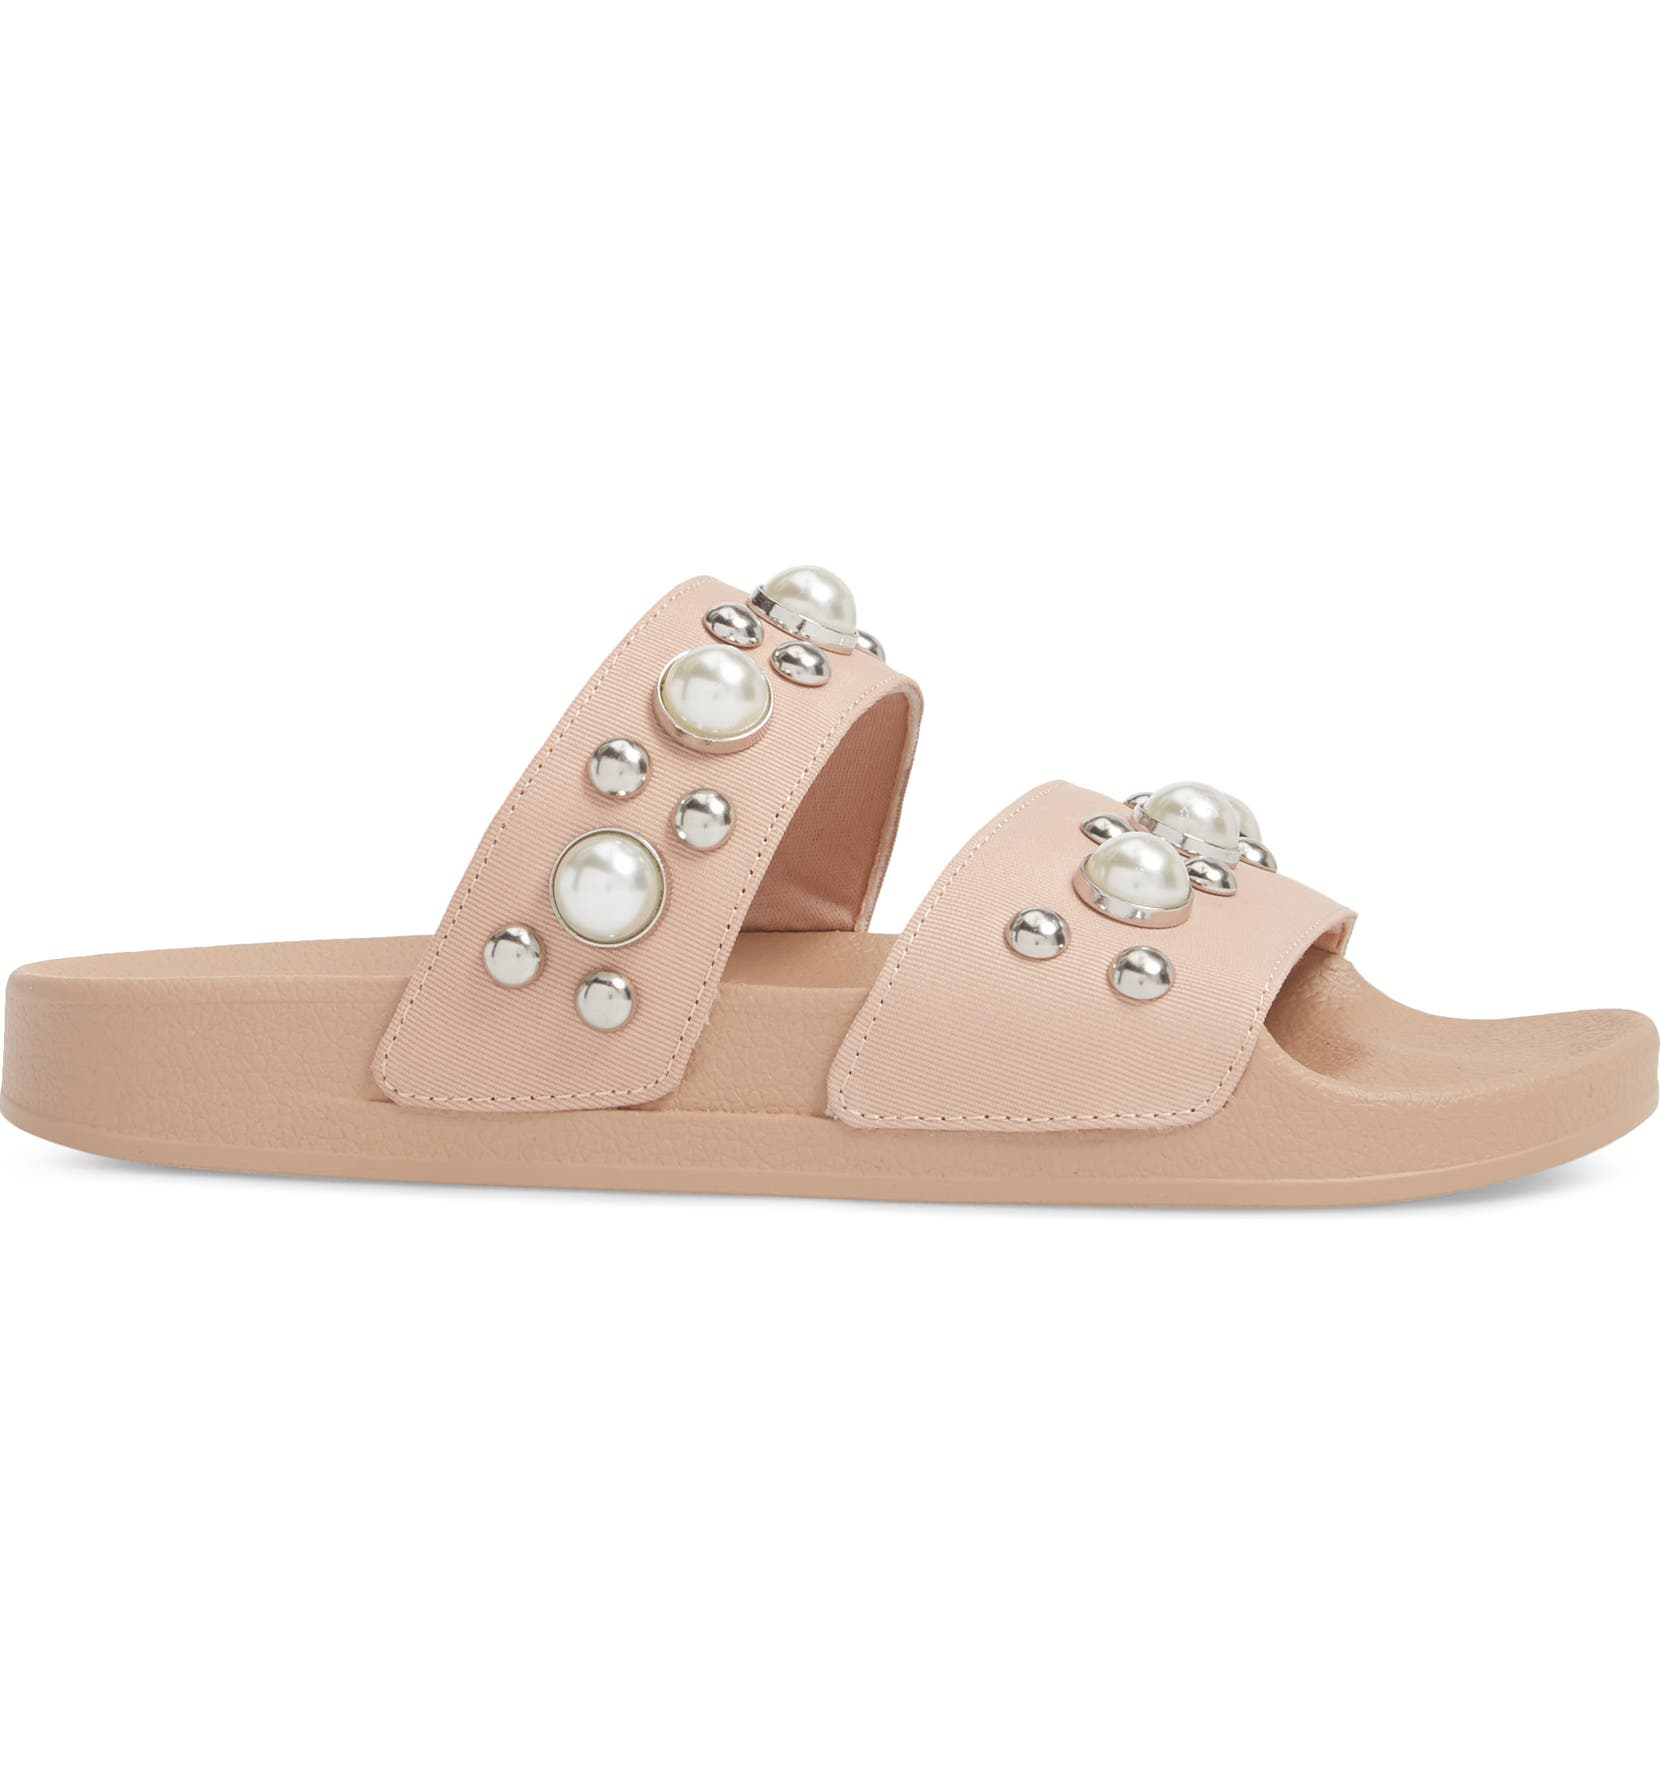 1165672b7a2 Steve Madden Polite Embellished Slide Sandal (Women)